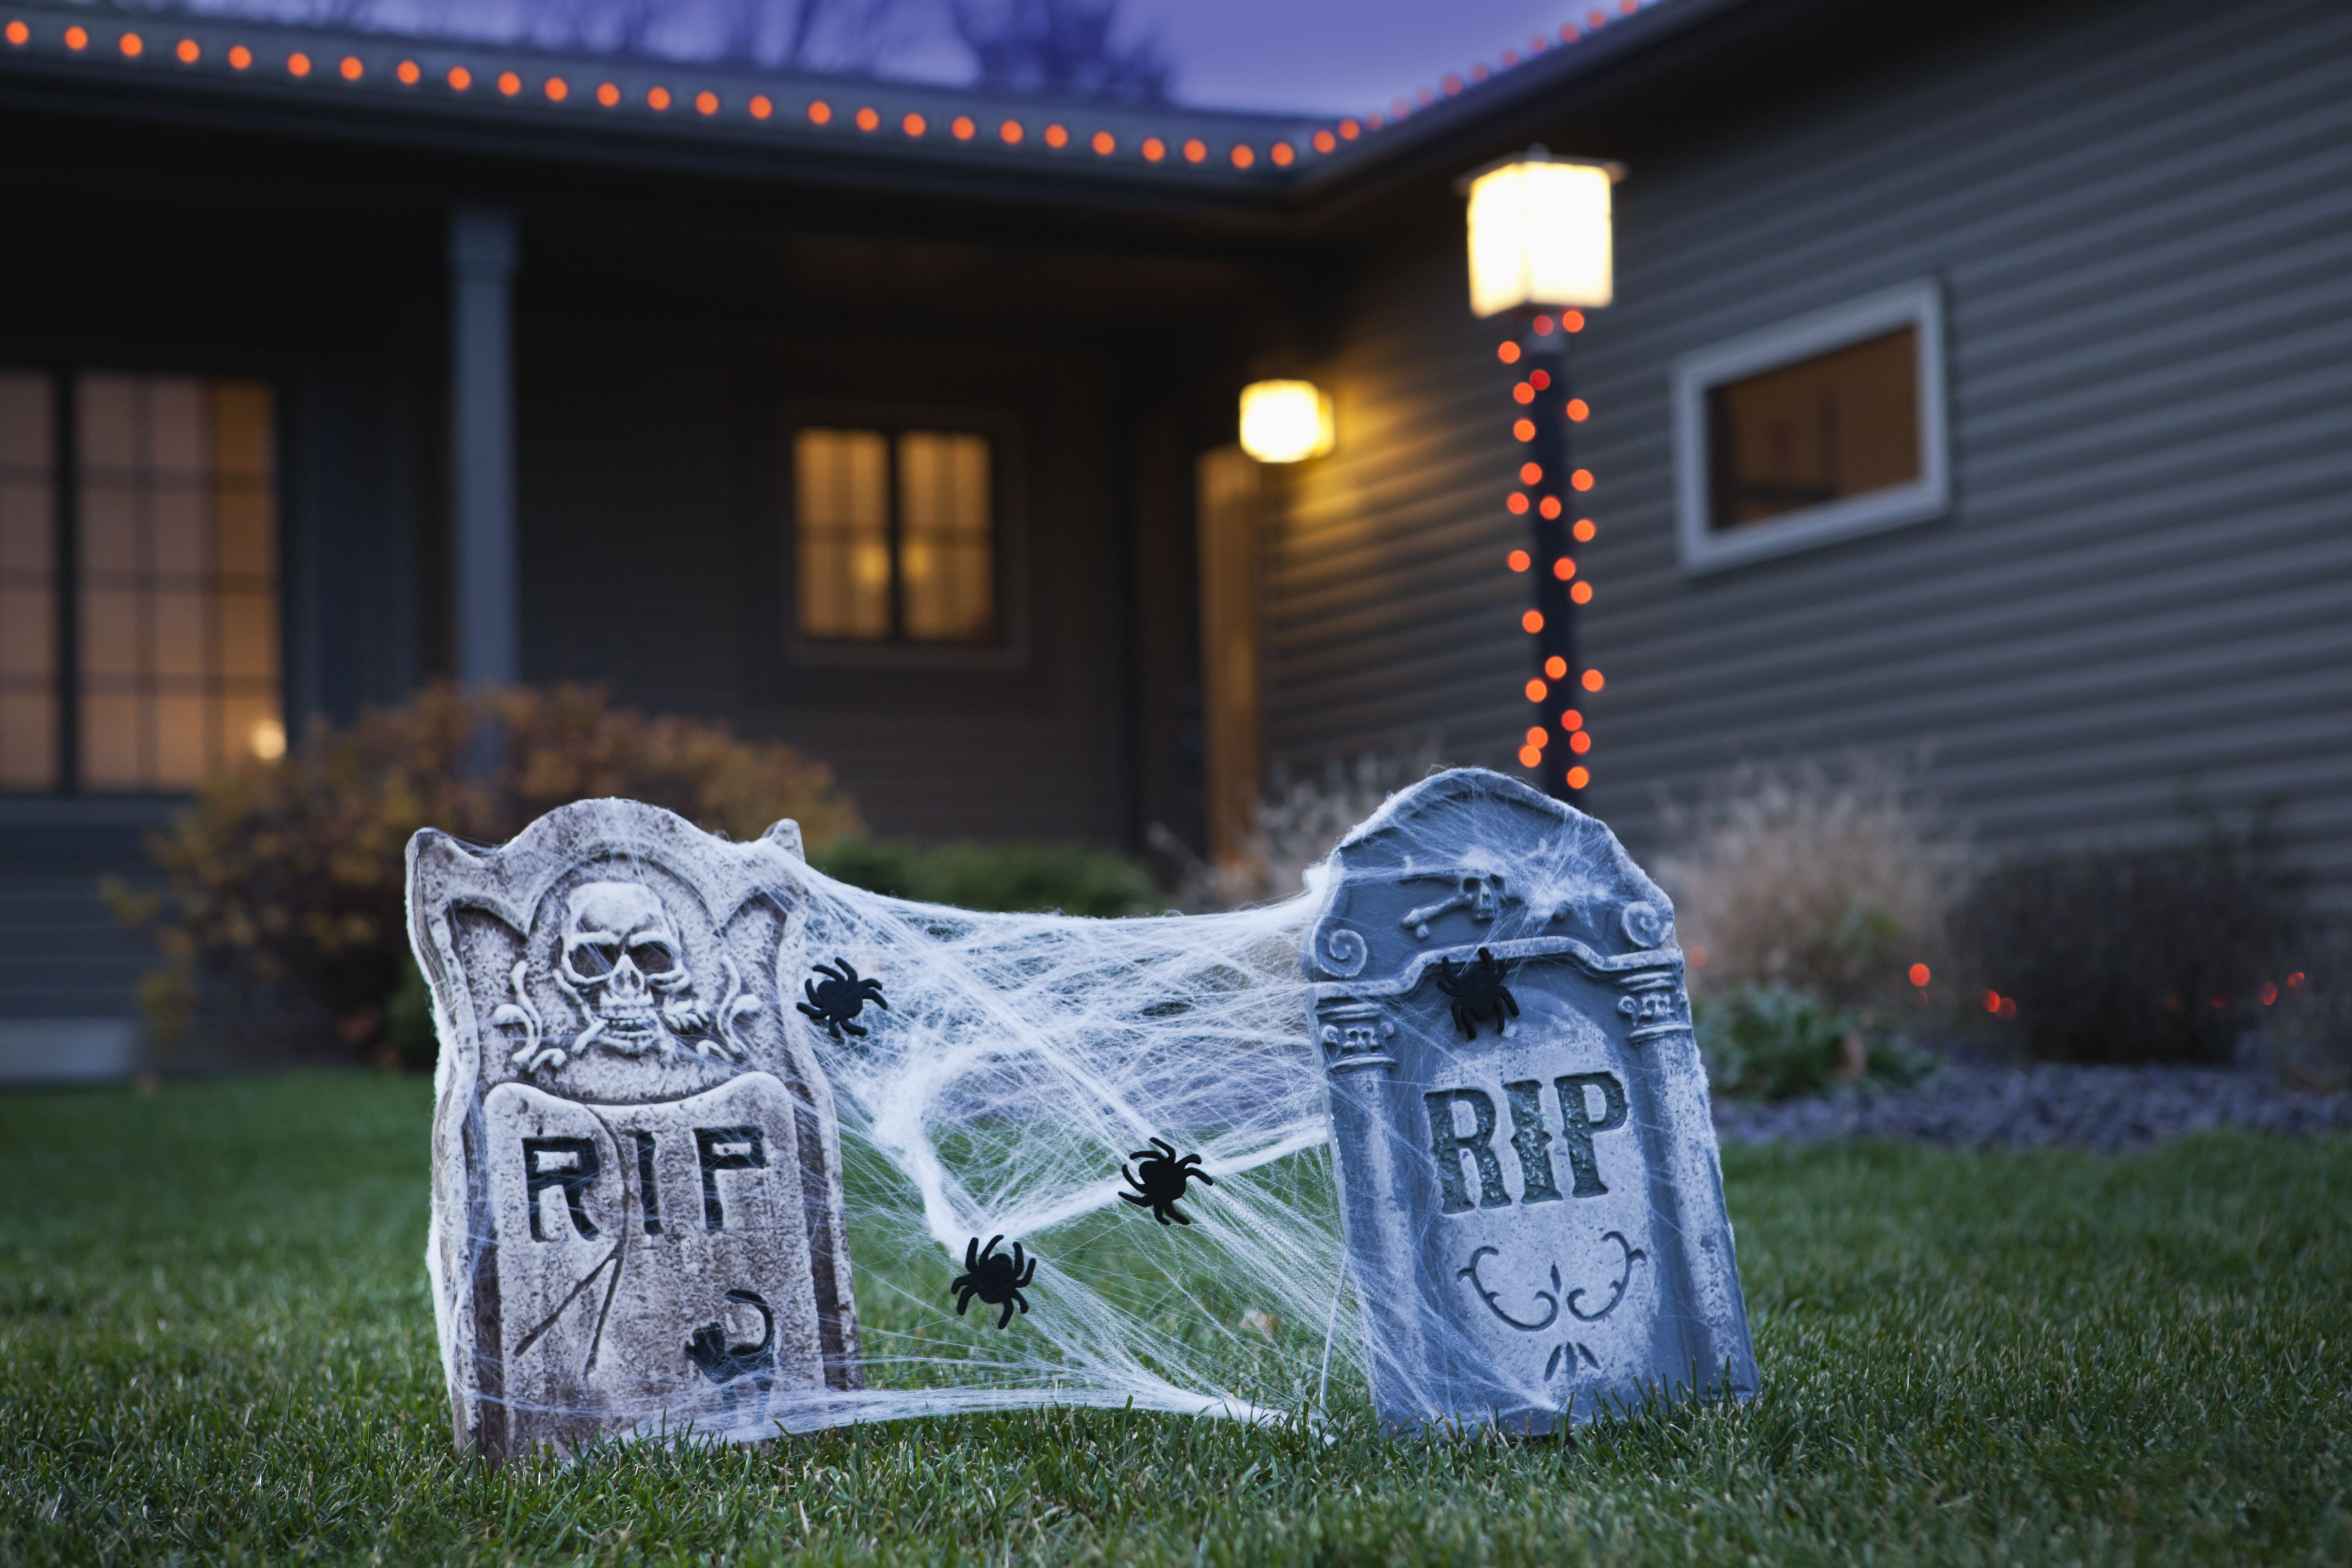 Halloween gravestone decoration on lawn